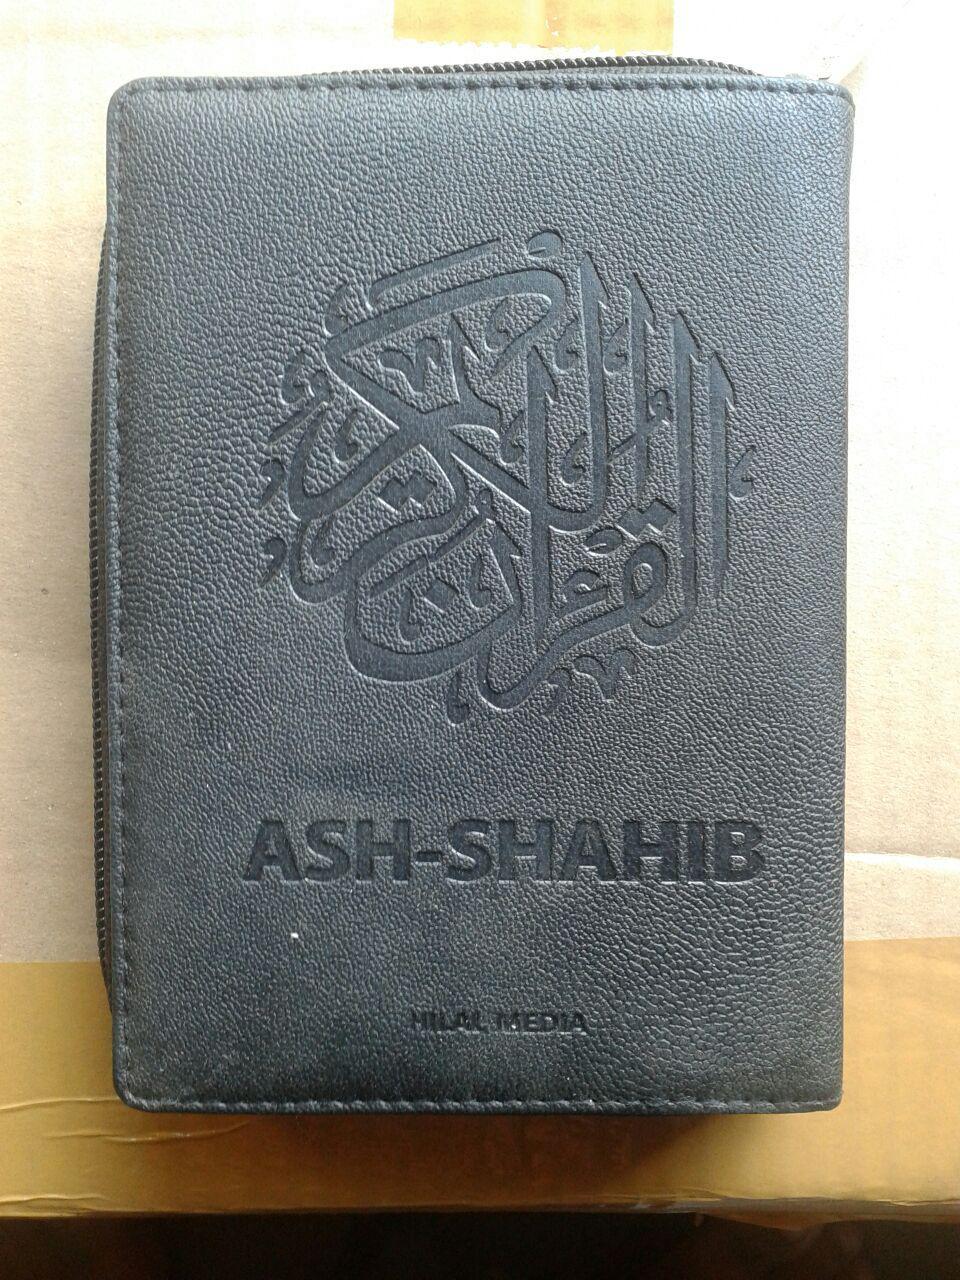 Al-Qur'an Terjemah Resleting Ash-Shahib Ukuran A6 cover 2